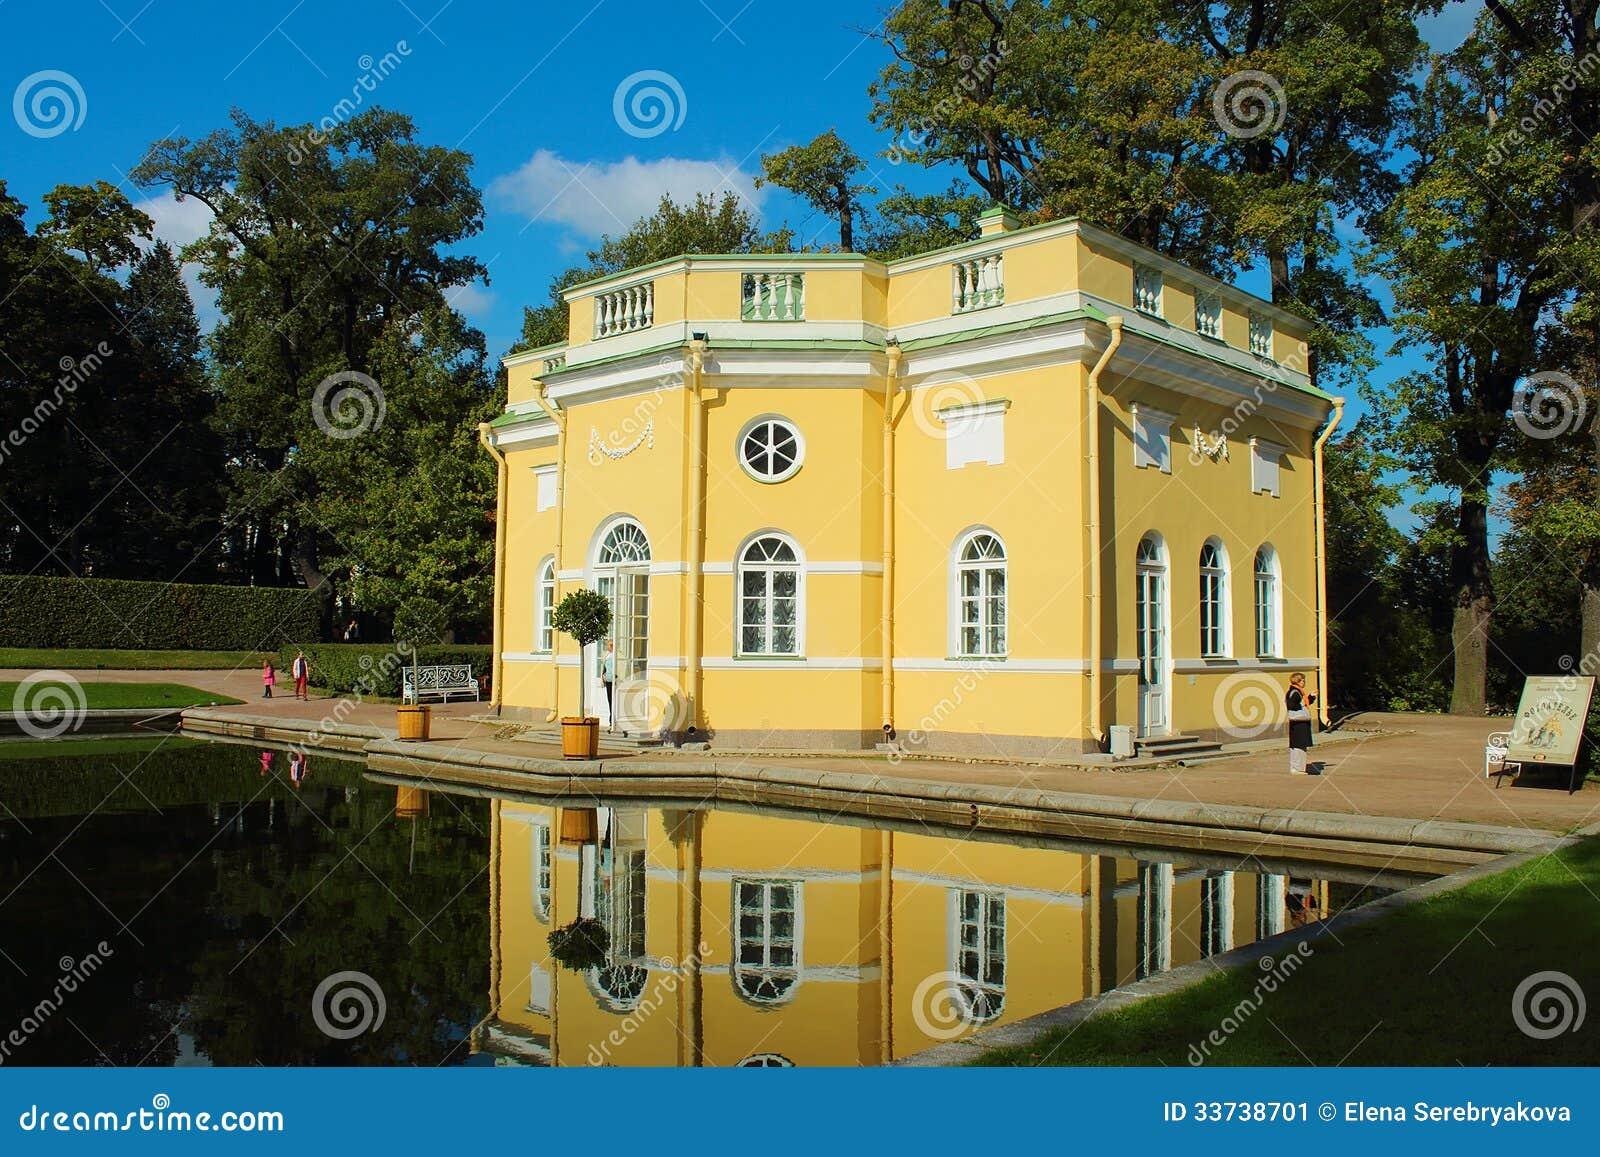 Павильон лета столетия 18. Россия, Санкт-Петербург, Tsarskoye Selo.